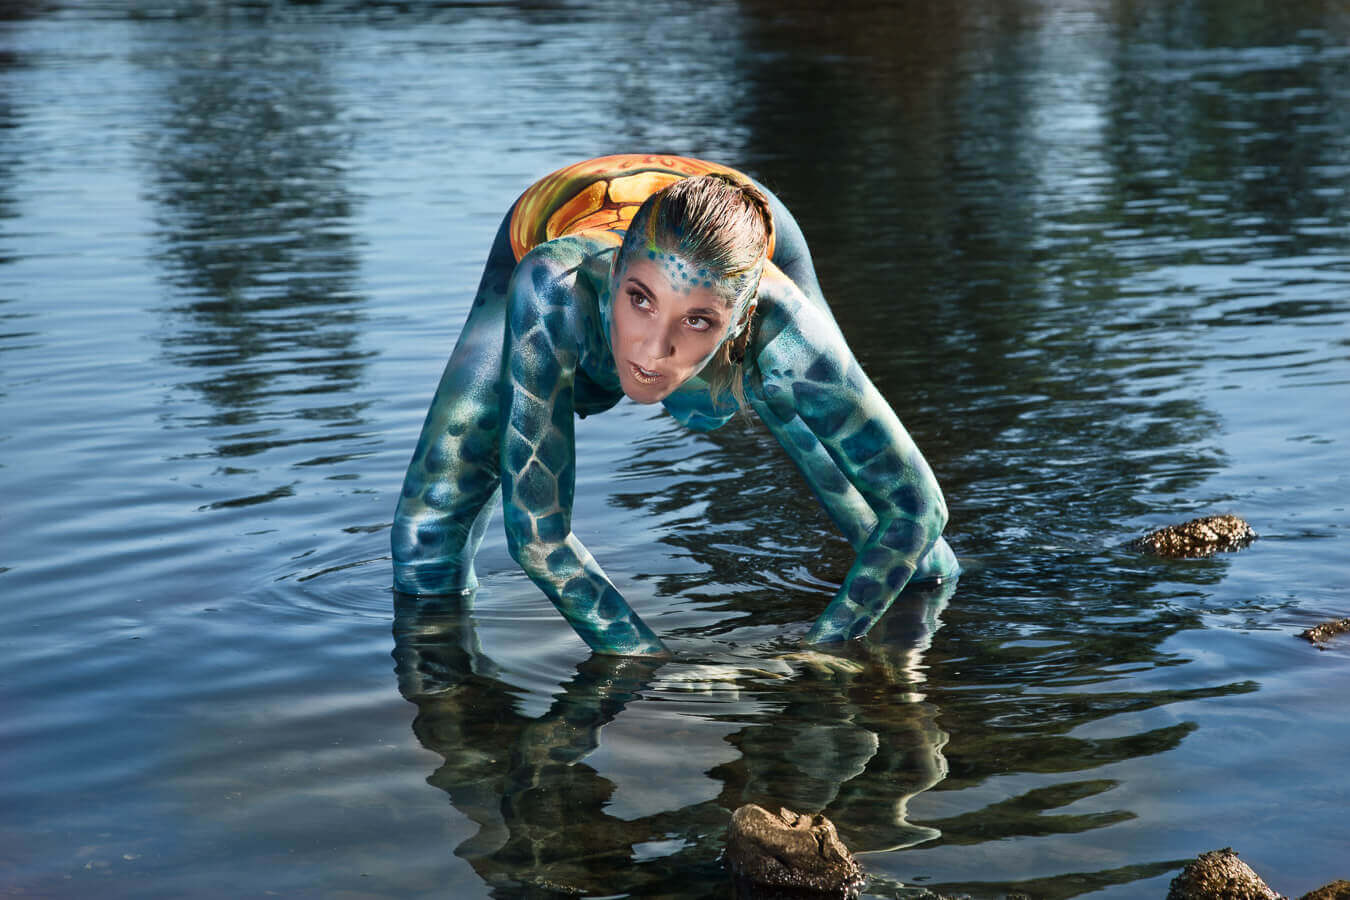 Fotograf-Fotostudio-Dresden-Painting-Body-Wasser-Kunst-Farbe-Colourful-Styling-Make up